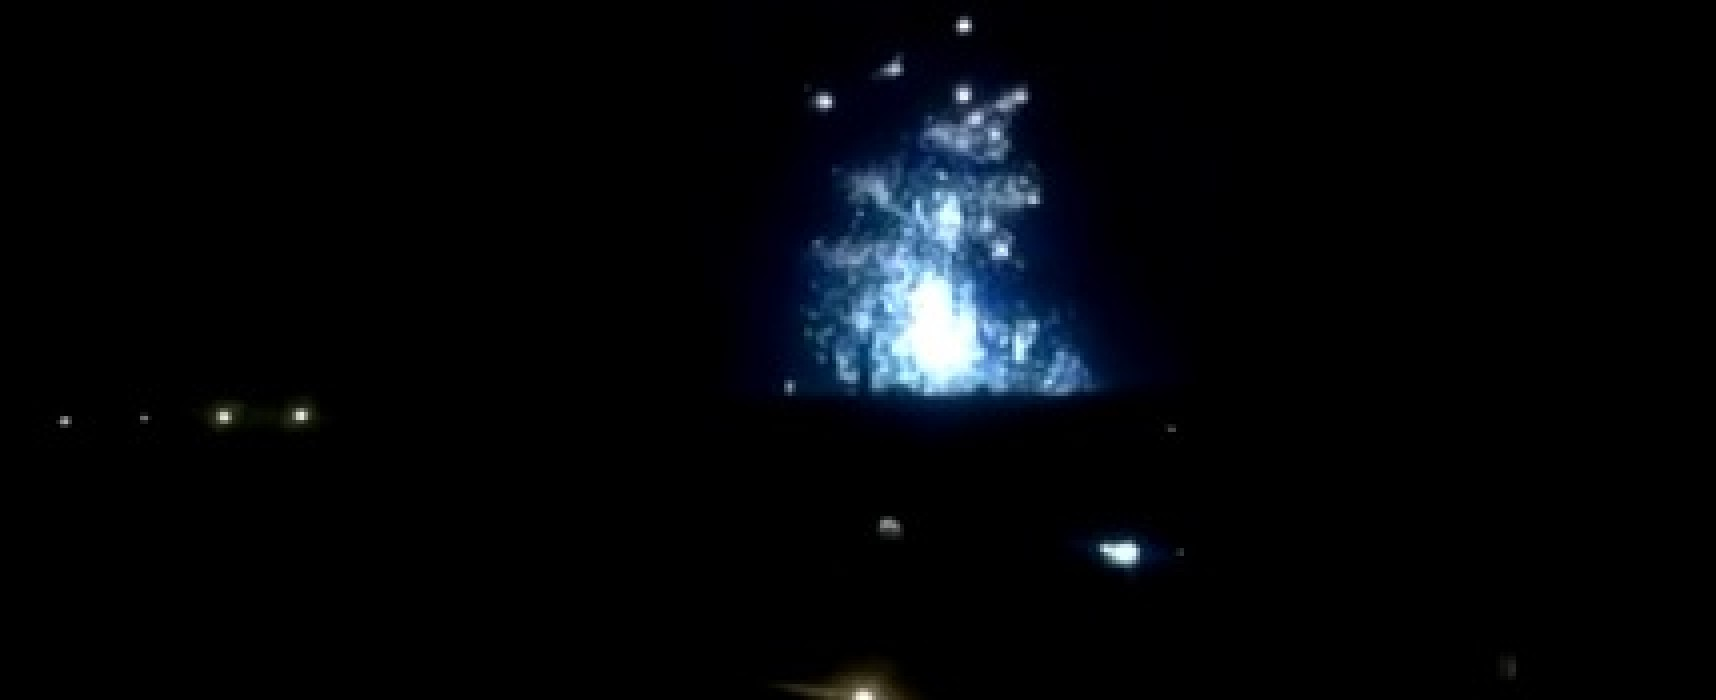 The Lie: Videos of Phosphorus Bombing of Donetsk